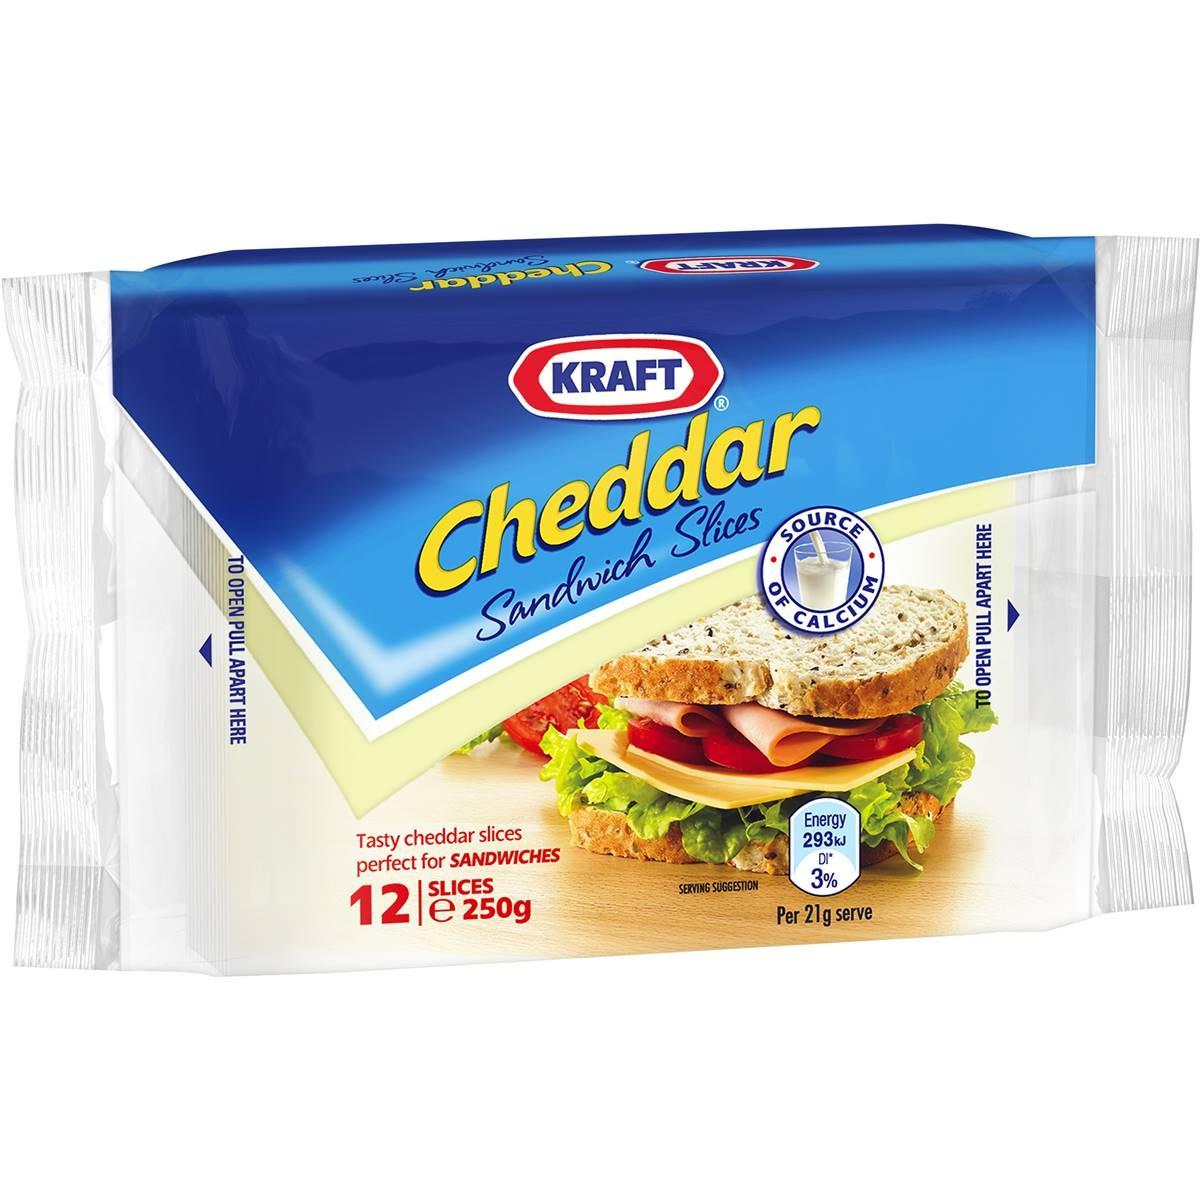 Kraft Cheese Cheddar Singles Slices 250g - KRAFT - Cheese - in Sri Lanka